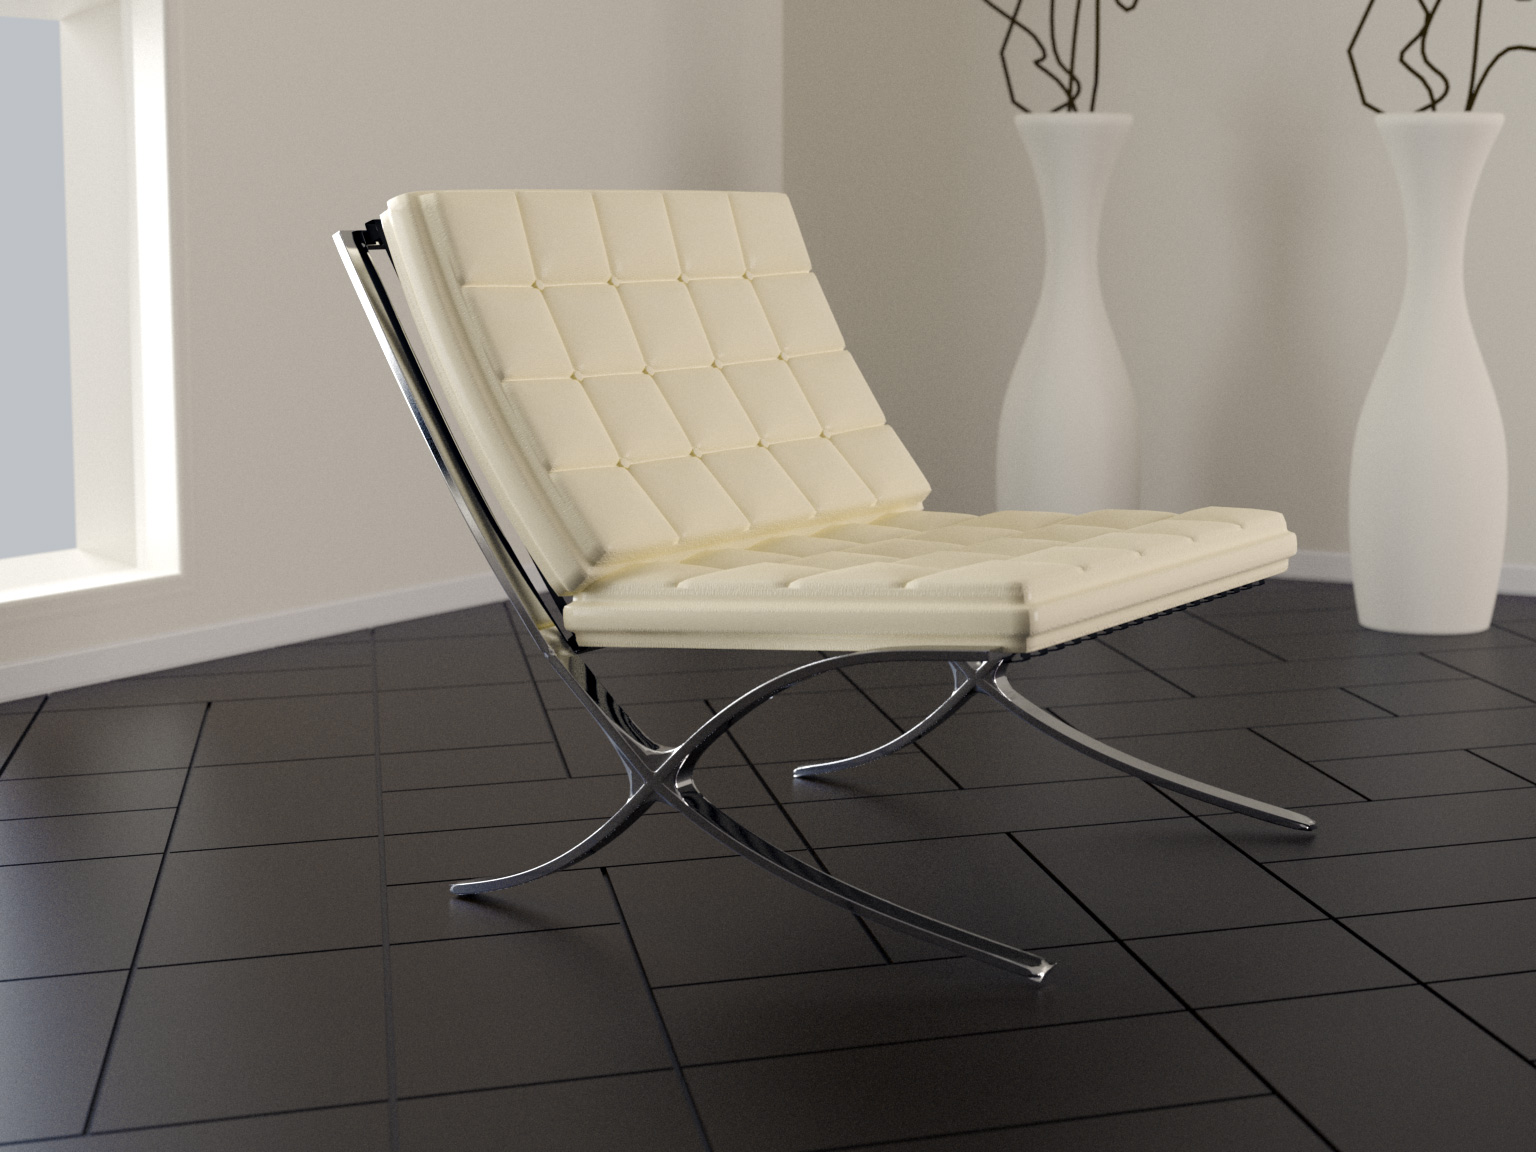 Barcelona chaise by iamzandar on deviantart for Chaise barcelona